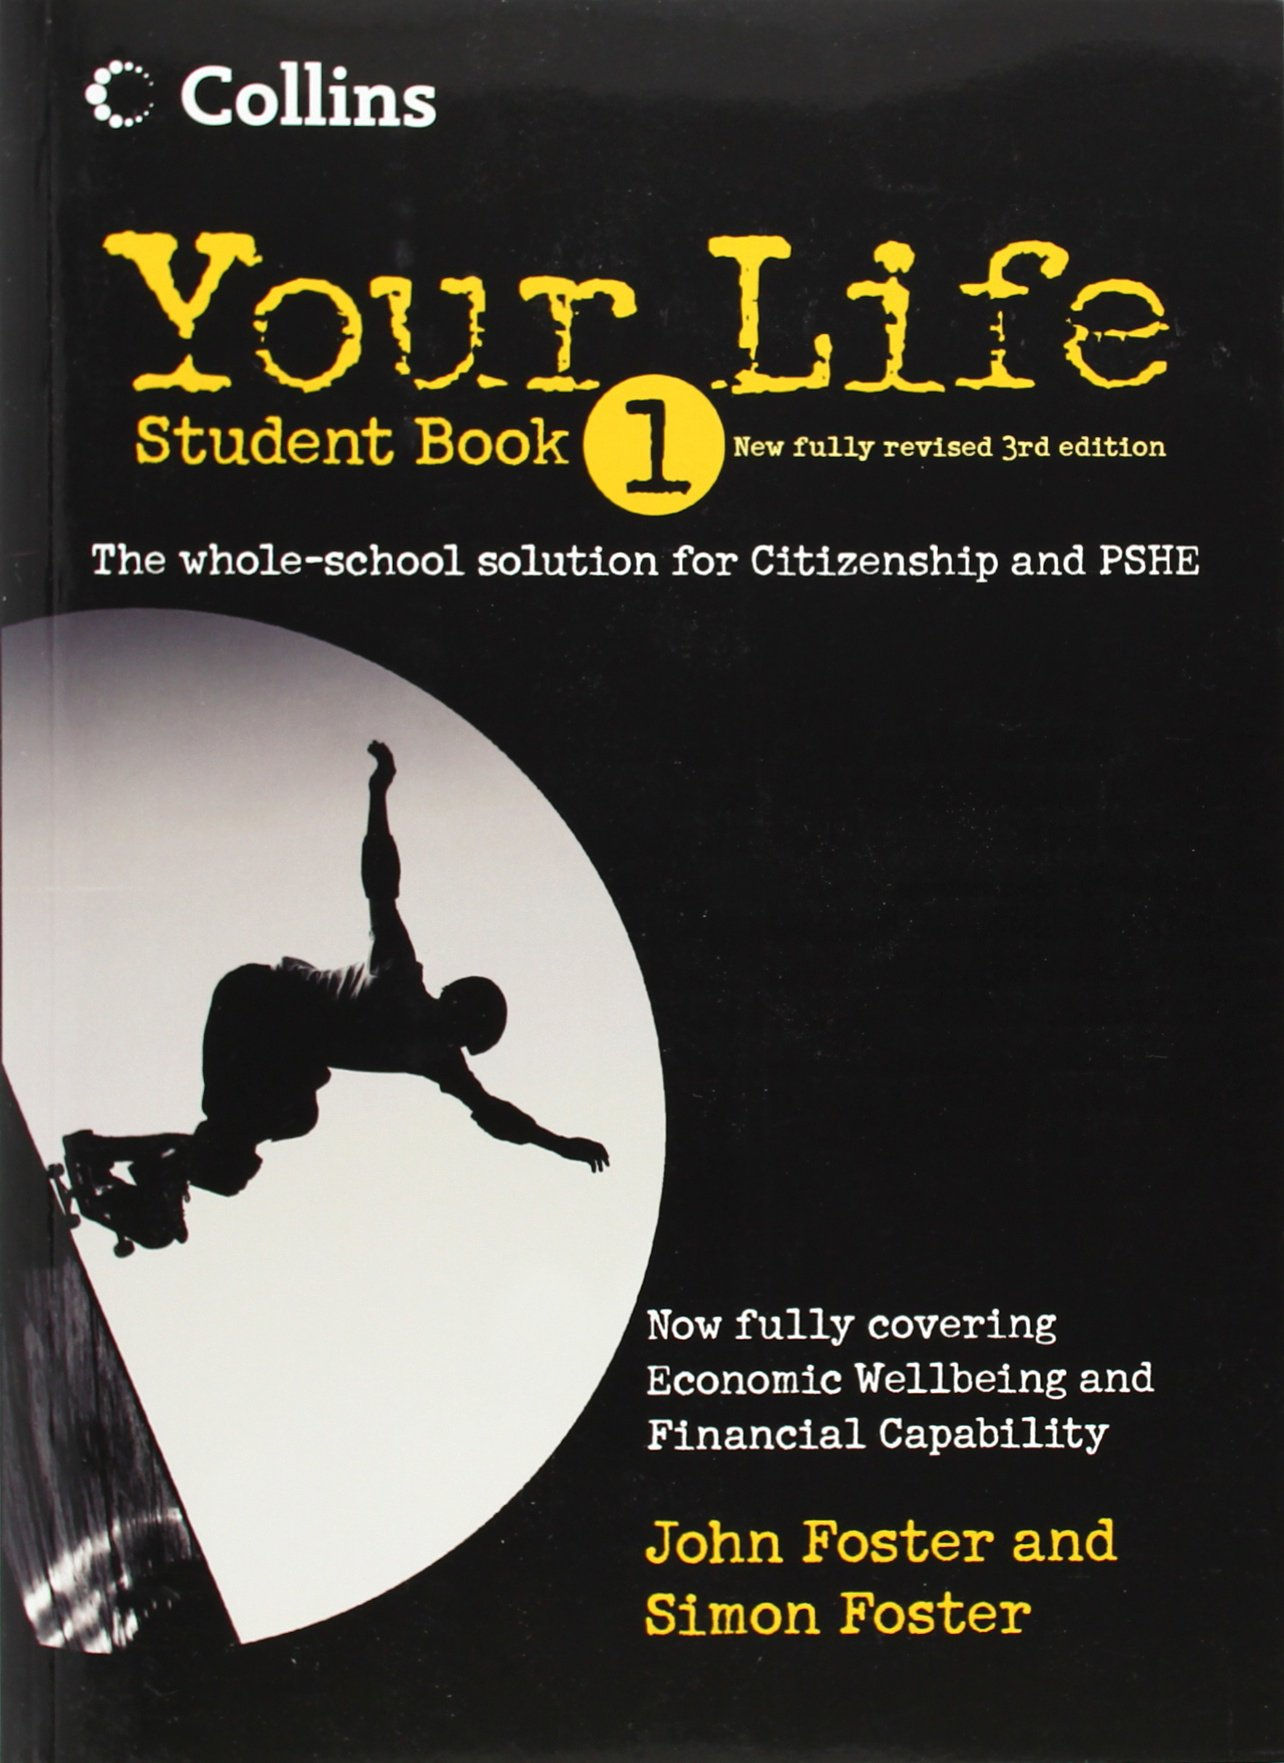 Poster design john foster - Your Life Student Book 1 Amazon Co Uk John Foster Simon Foster 9780007312450 Books